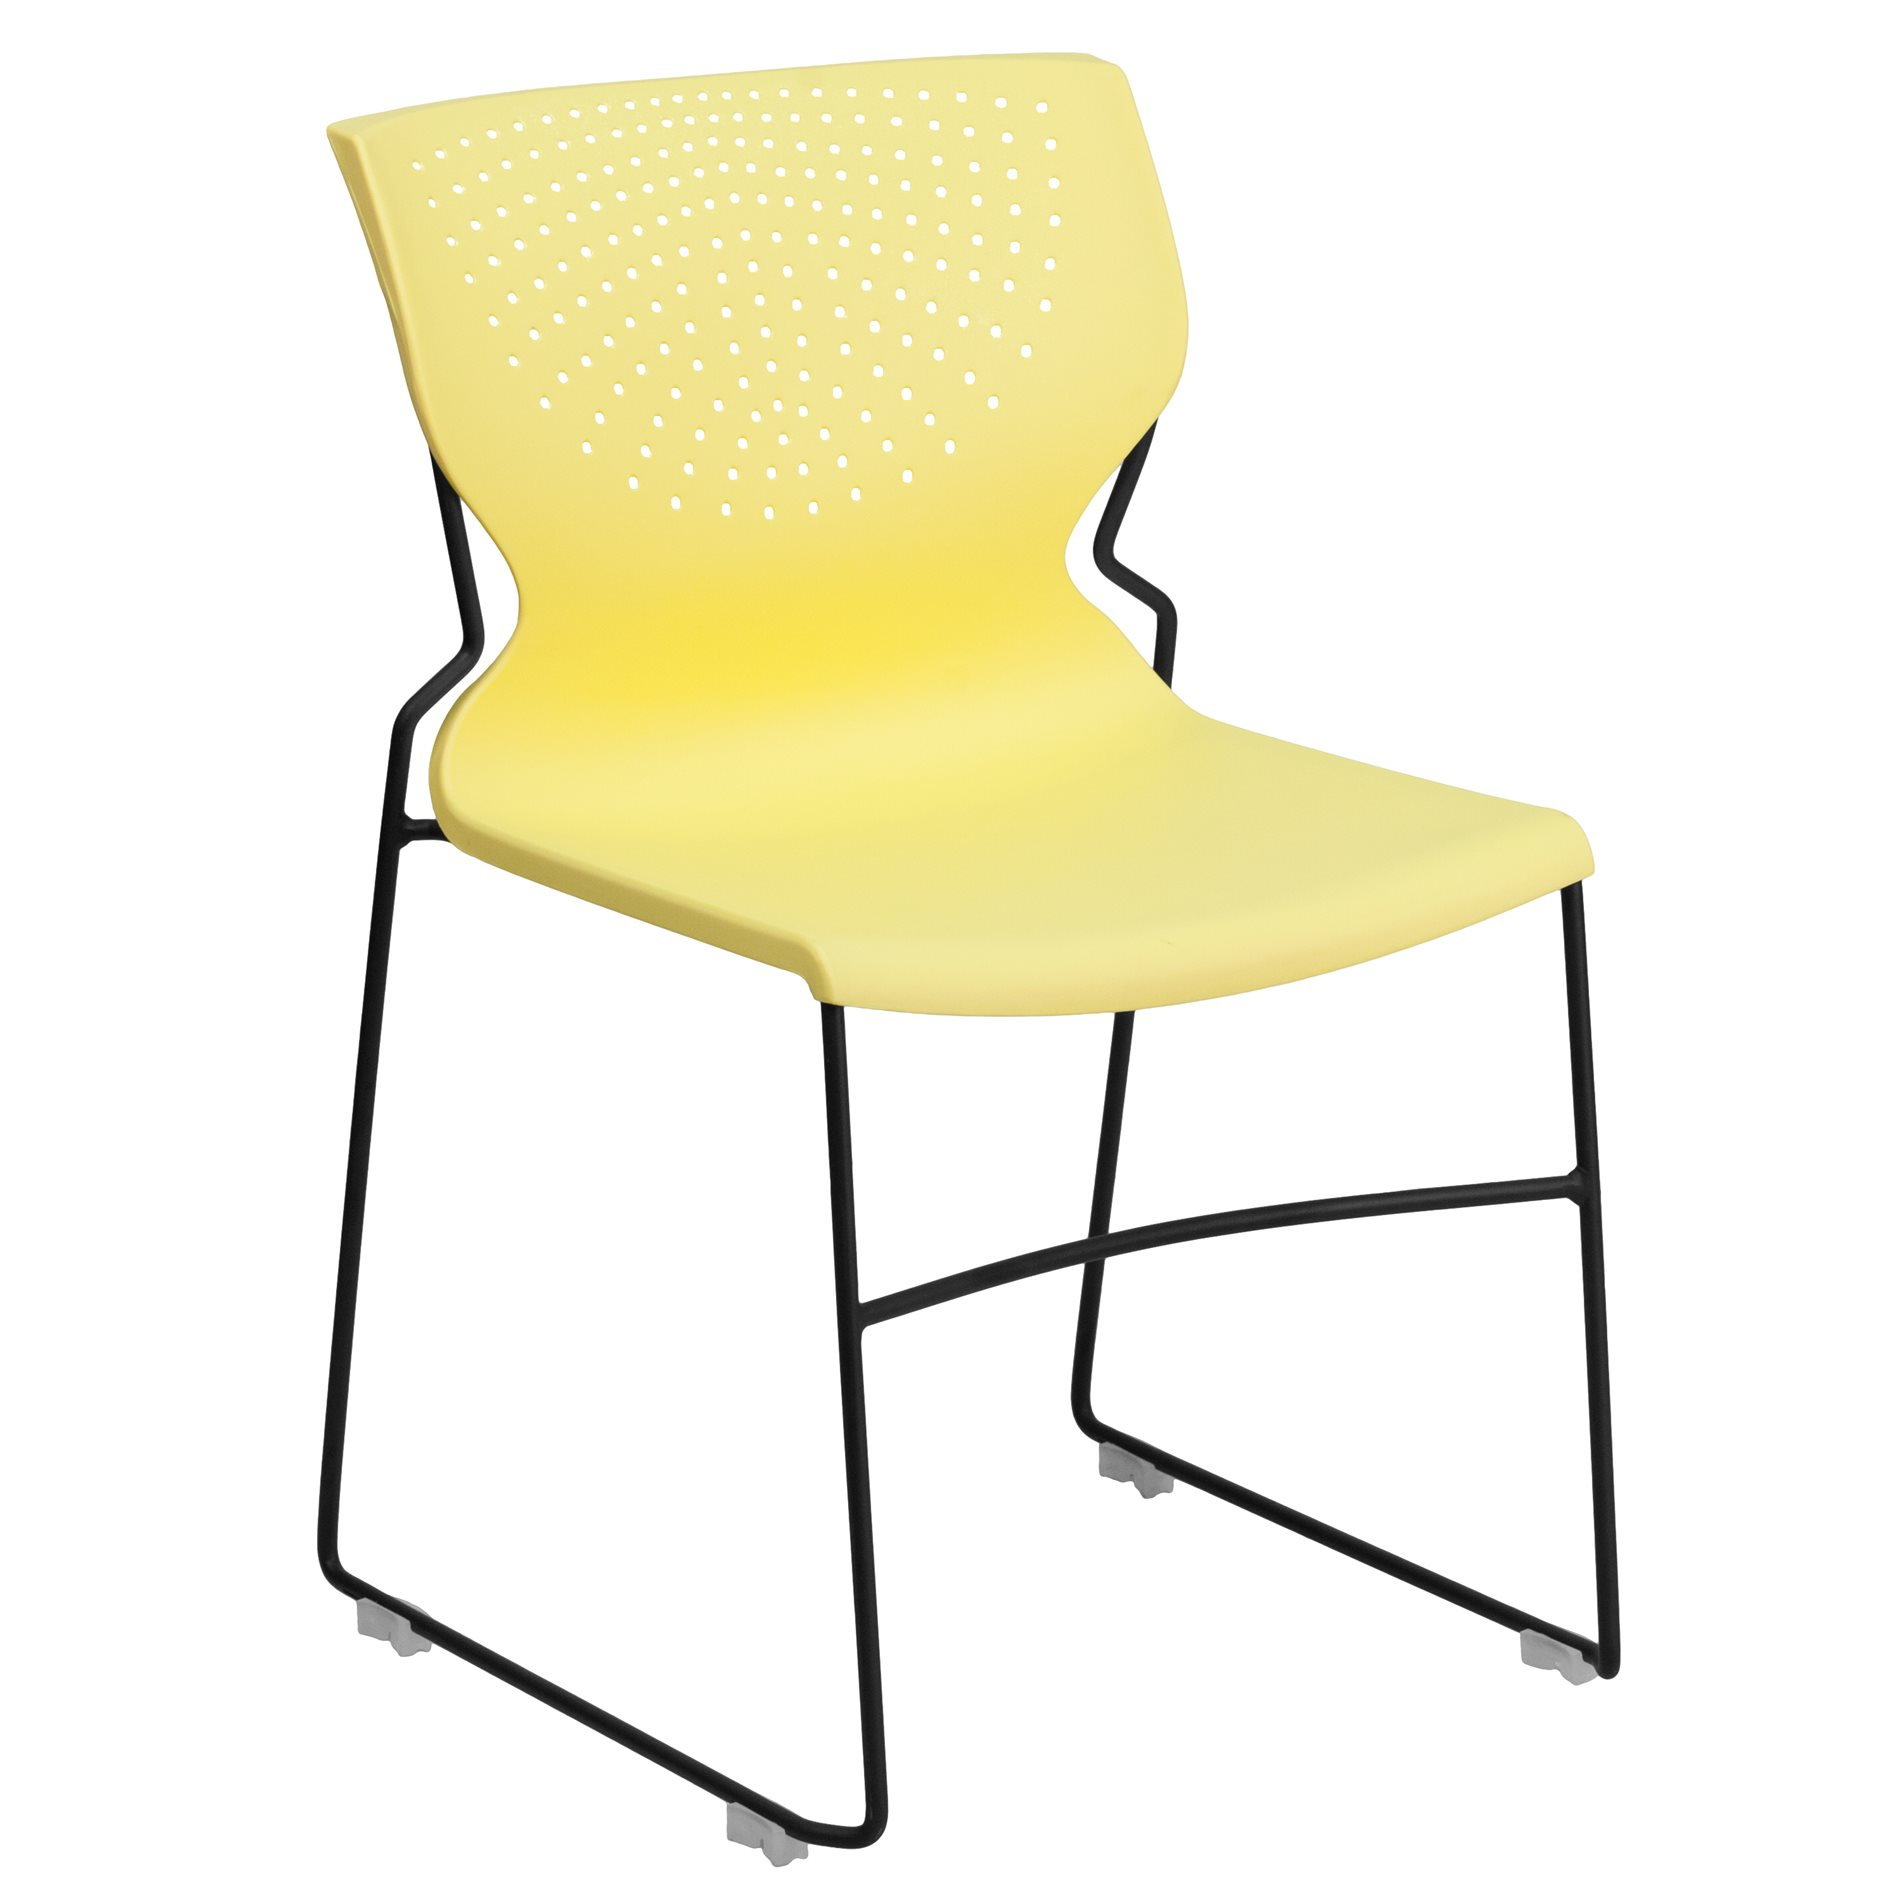 28 miami stack yellow patio chair casbah yellow stacking chair stacking chairs and rattan Home depot patio furniture miami